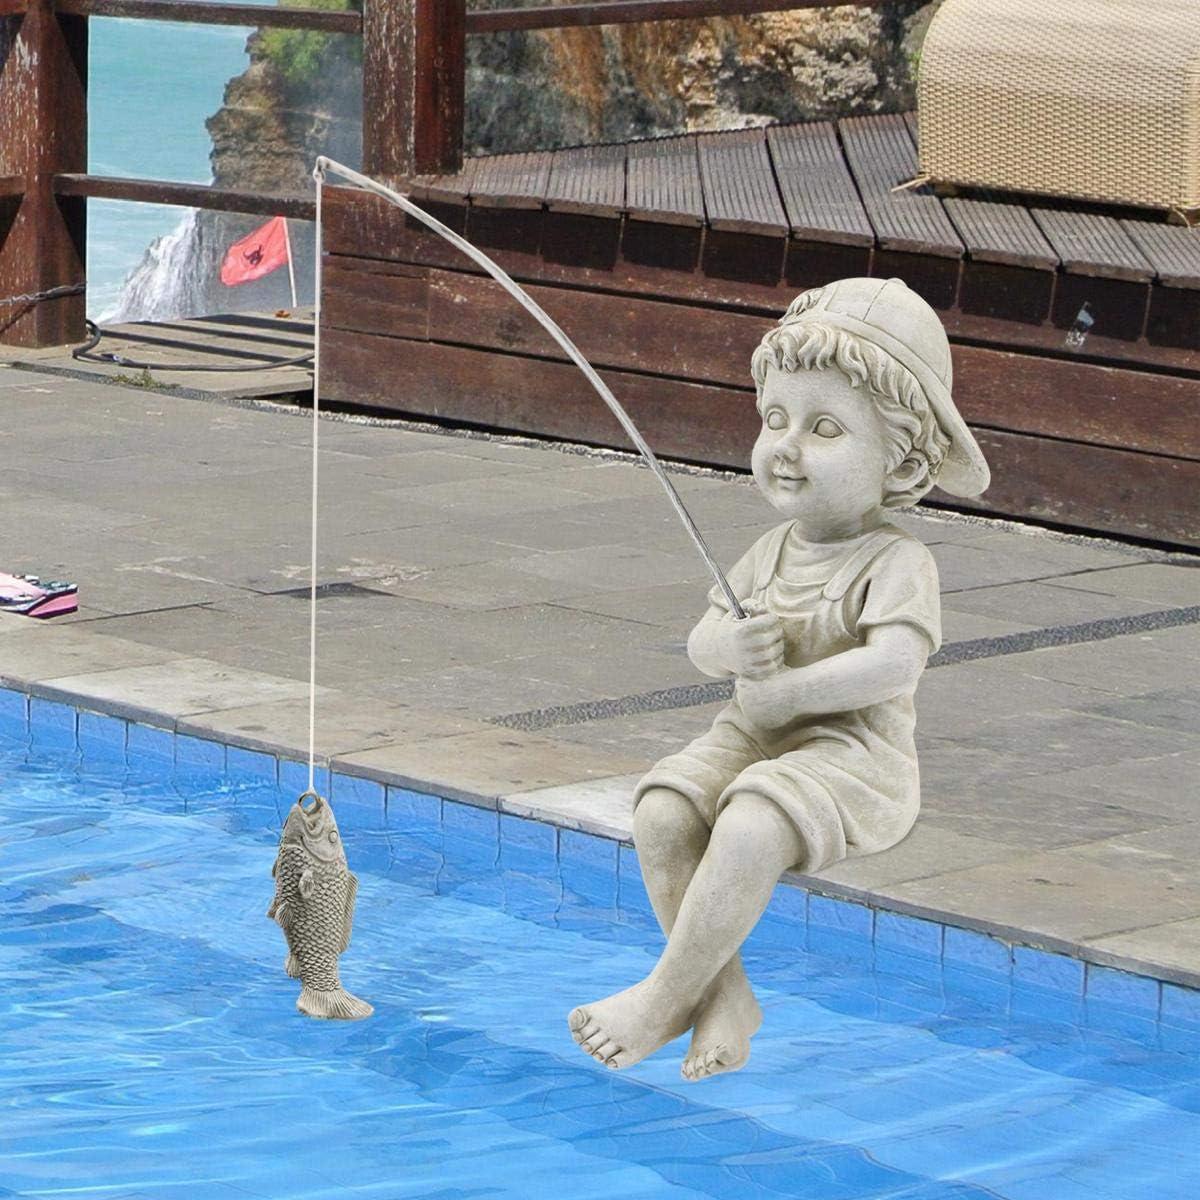 Goodeco The Little Fisherboy Garden ornament,Boy fisherman Figurine Sculpture,Outdoor Yard Lawn Pool Pond Fishing statue,28cm